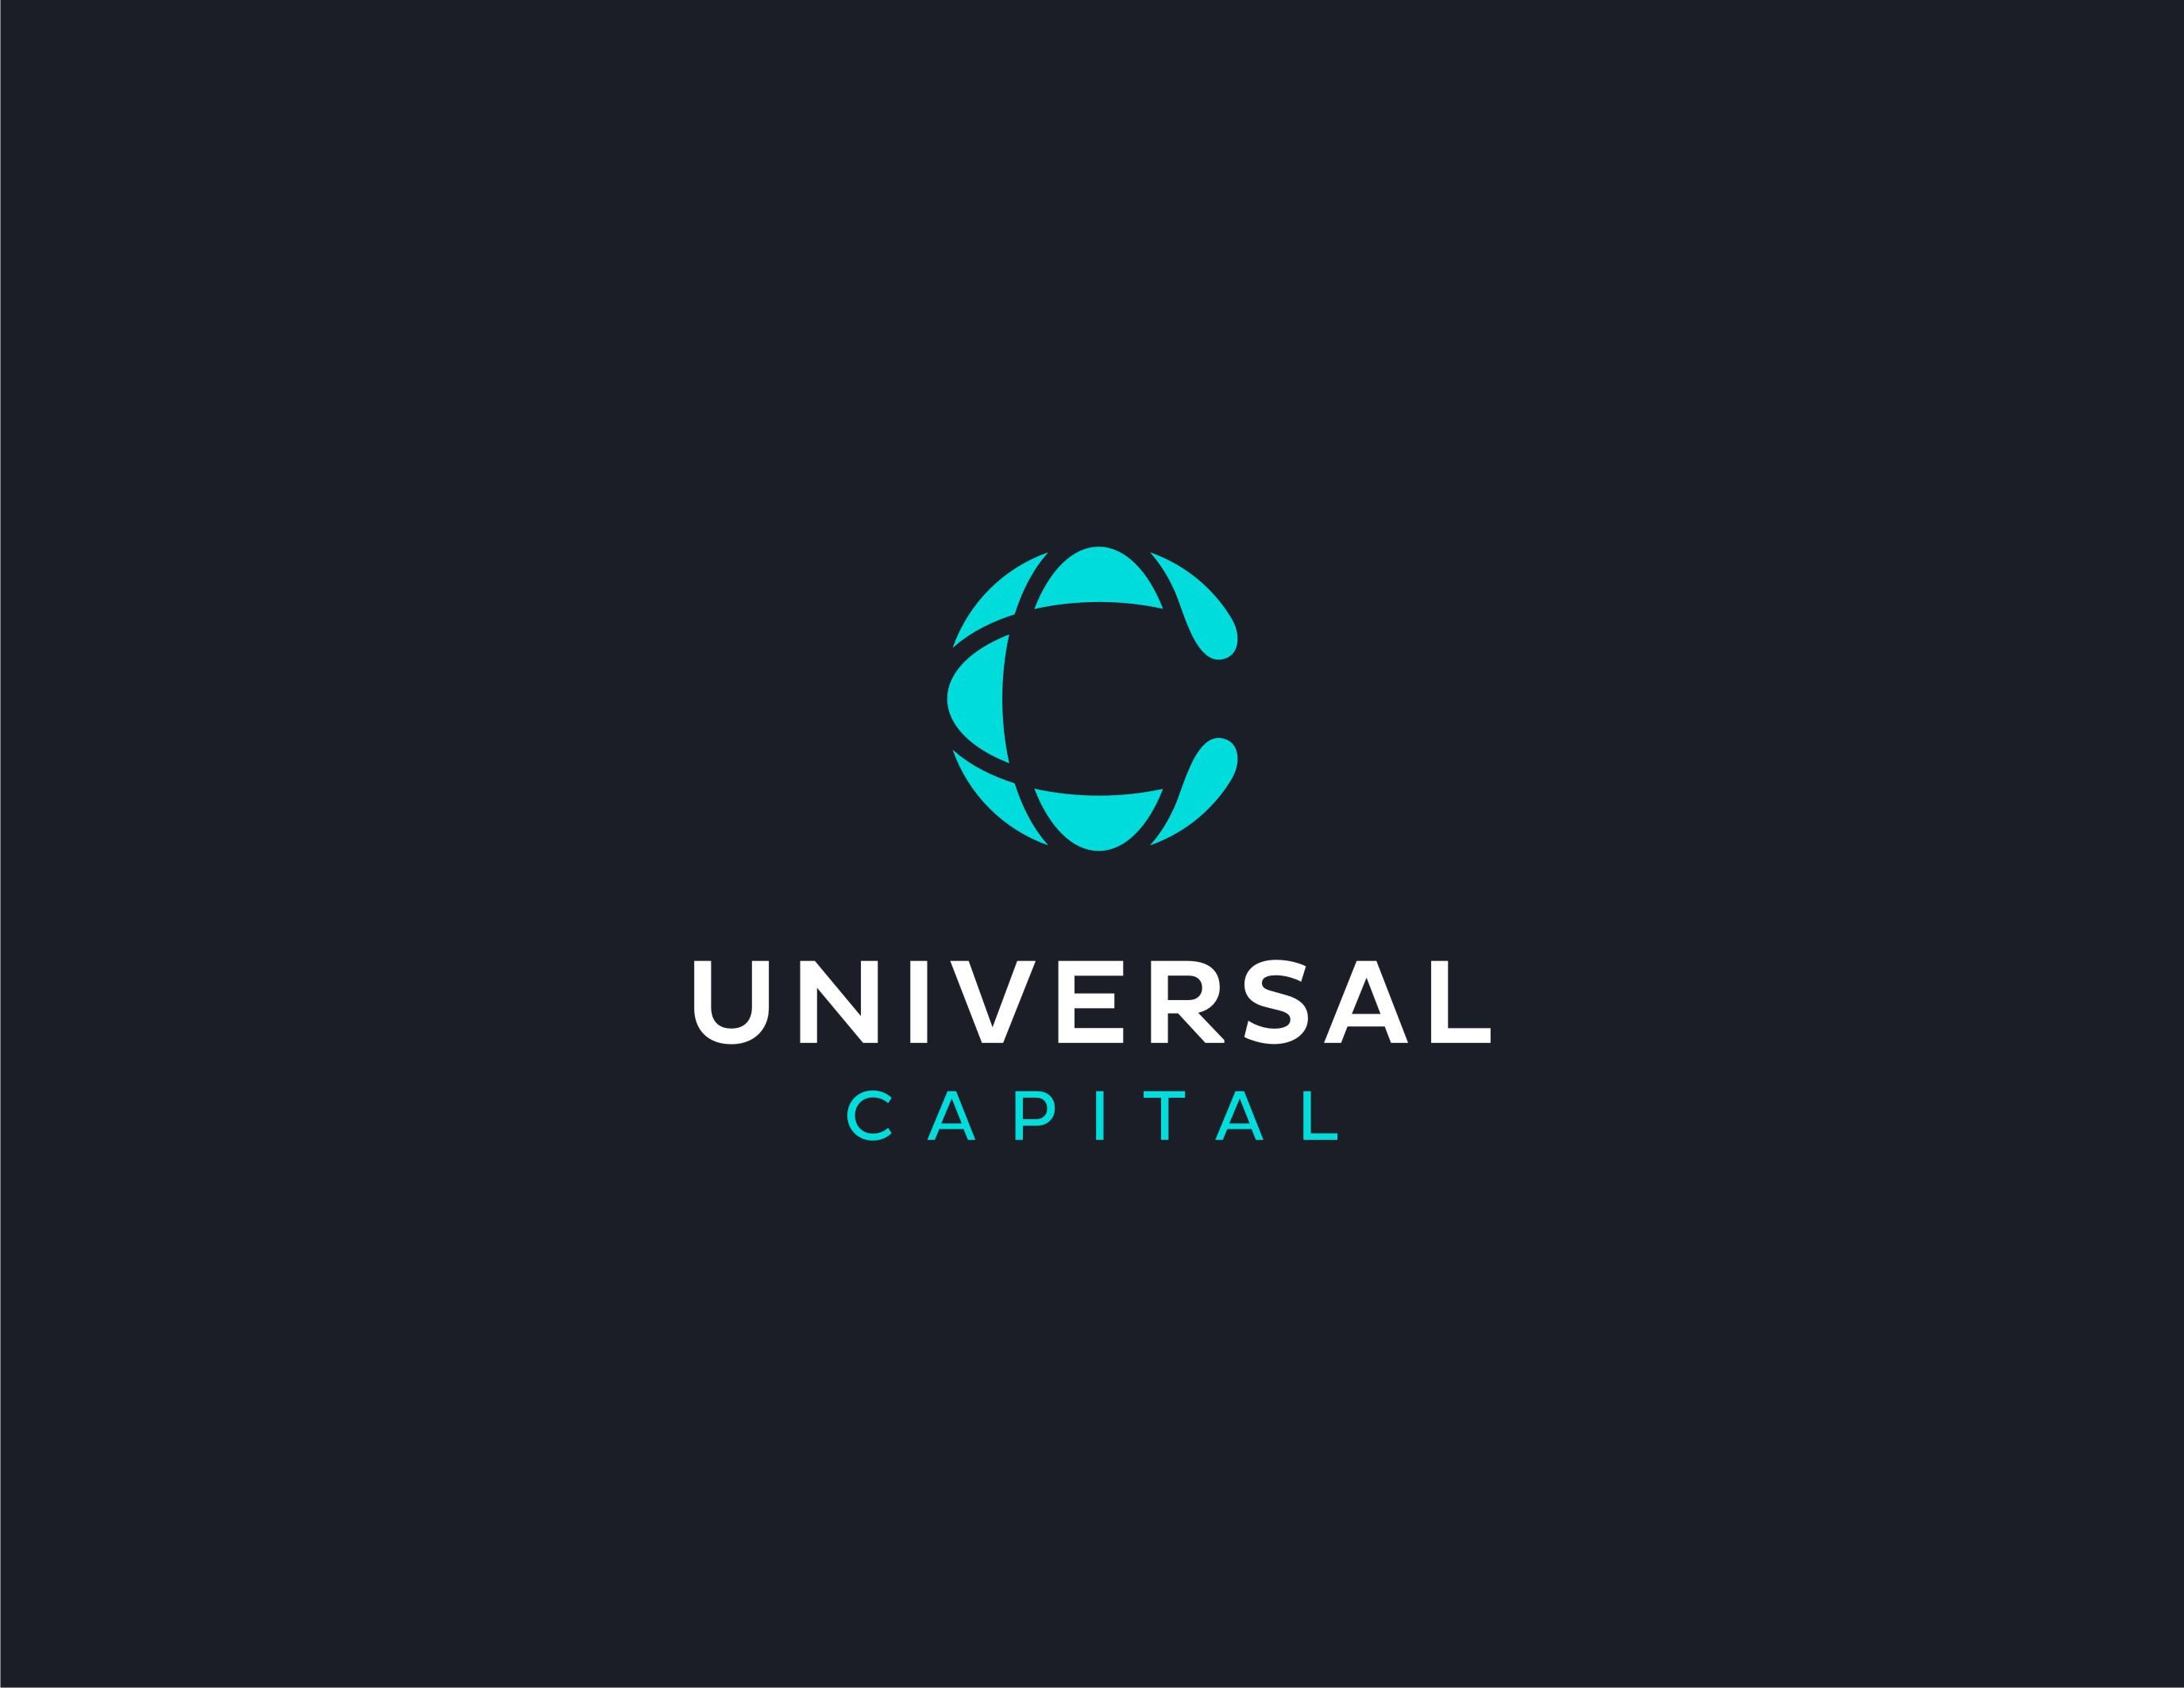 Holding company needs a powerful logo